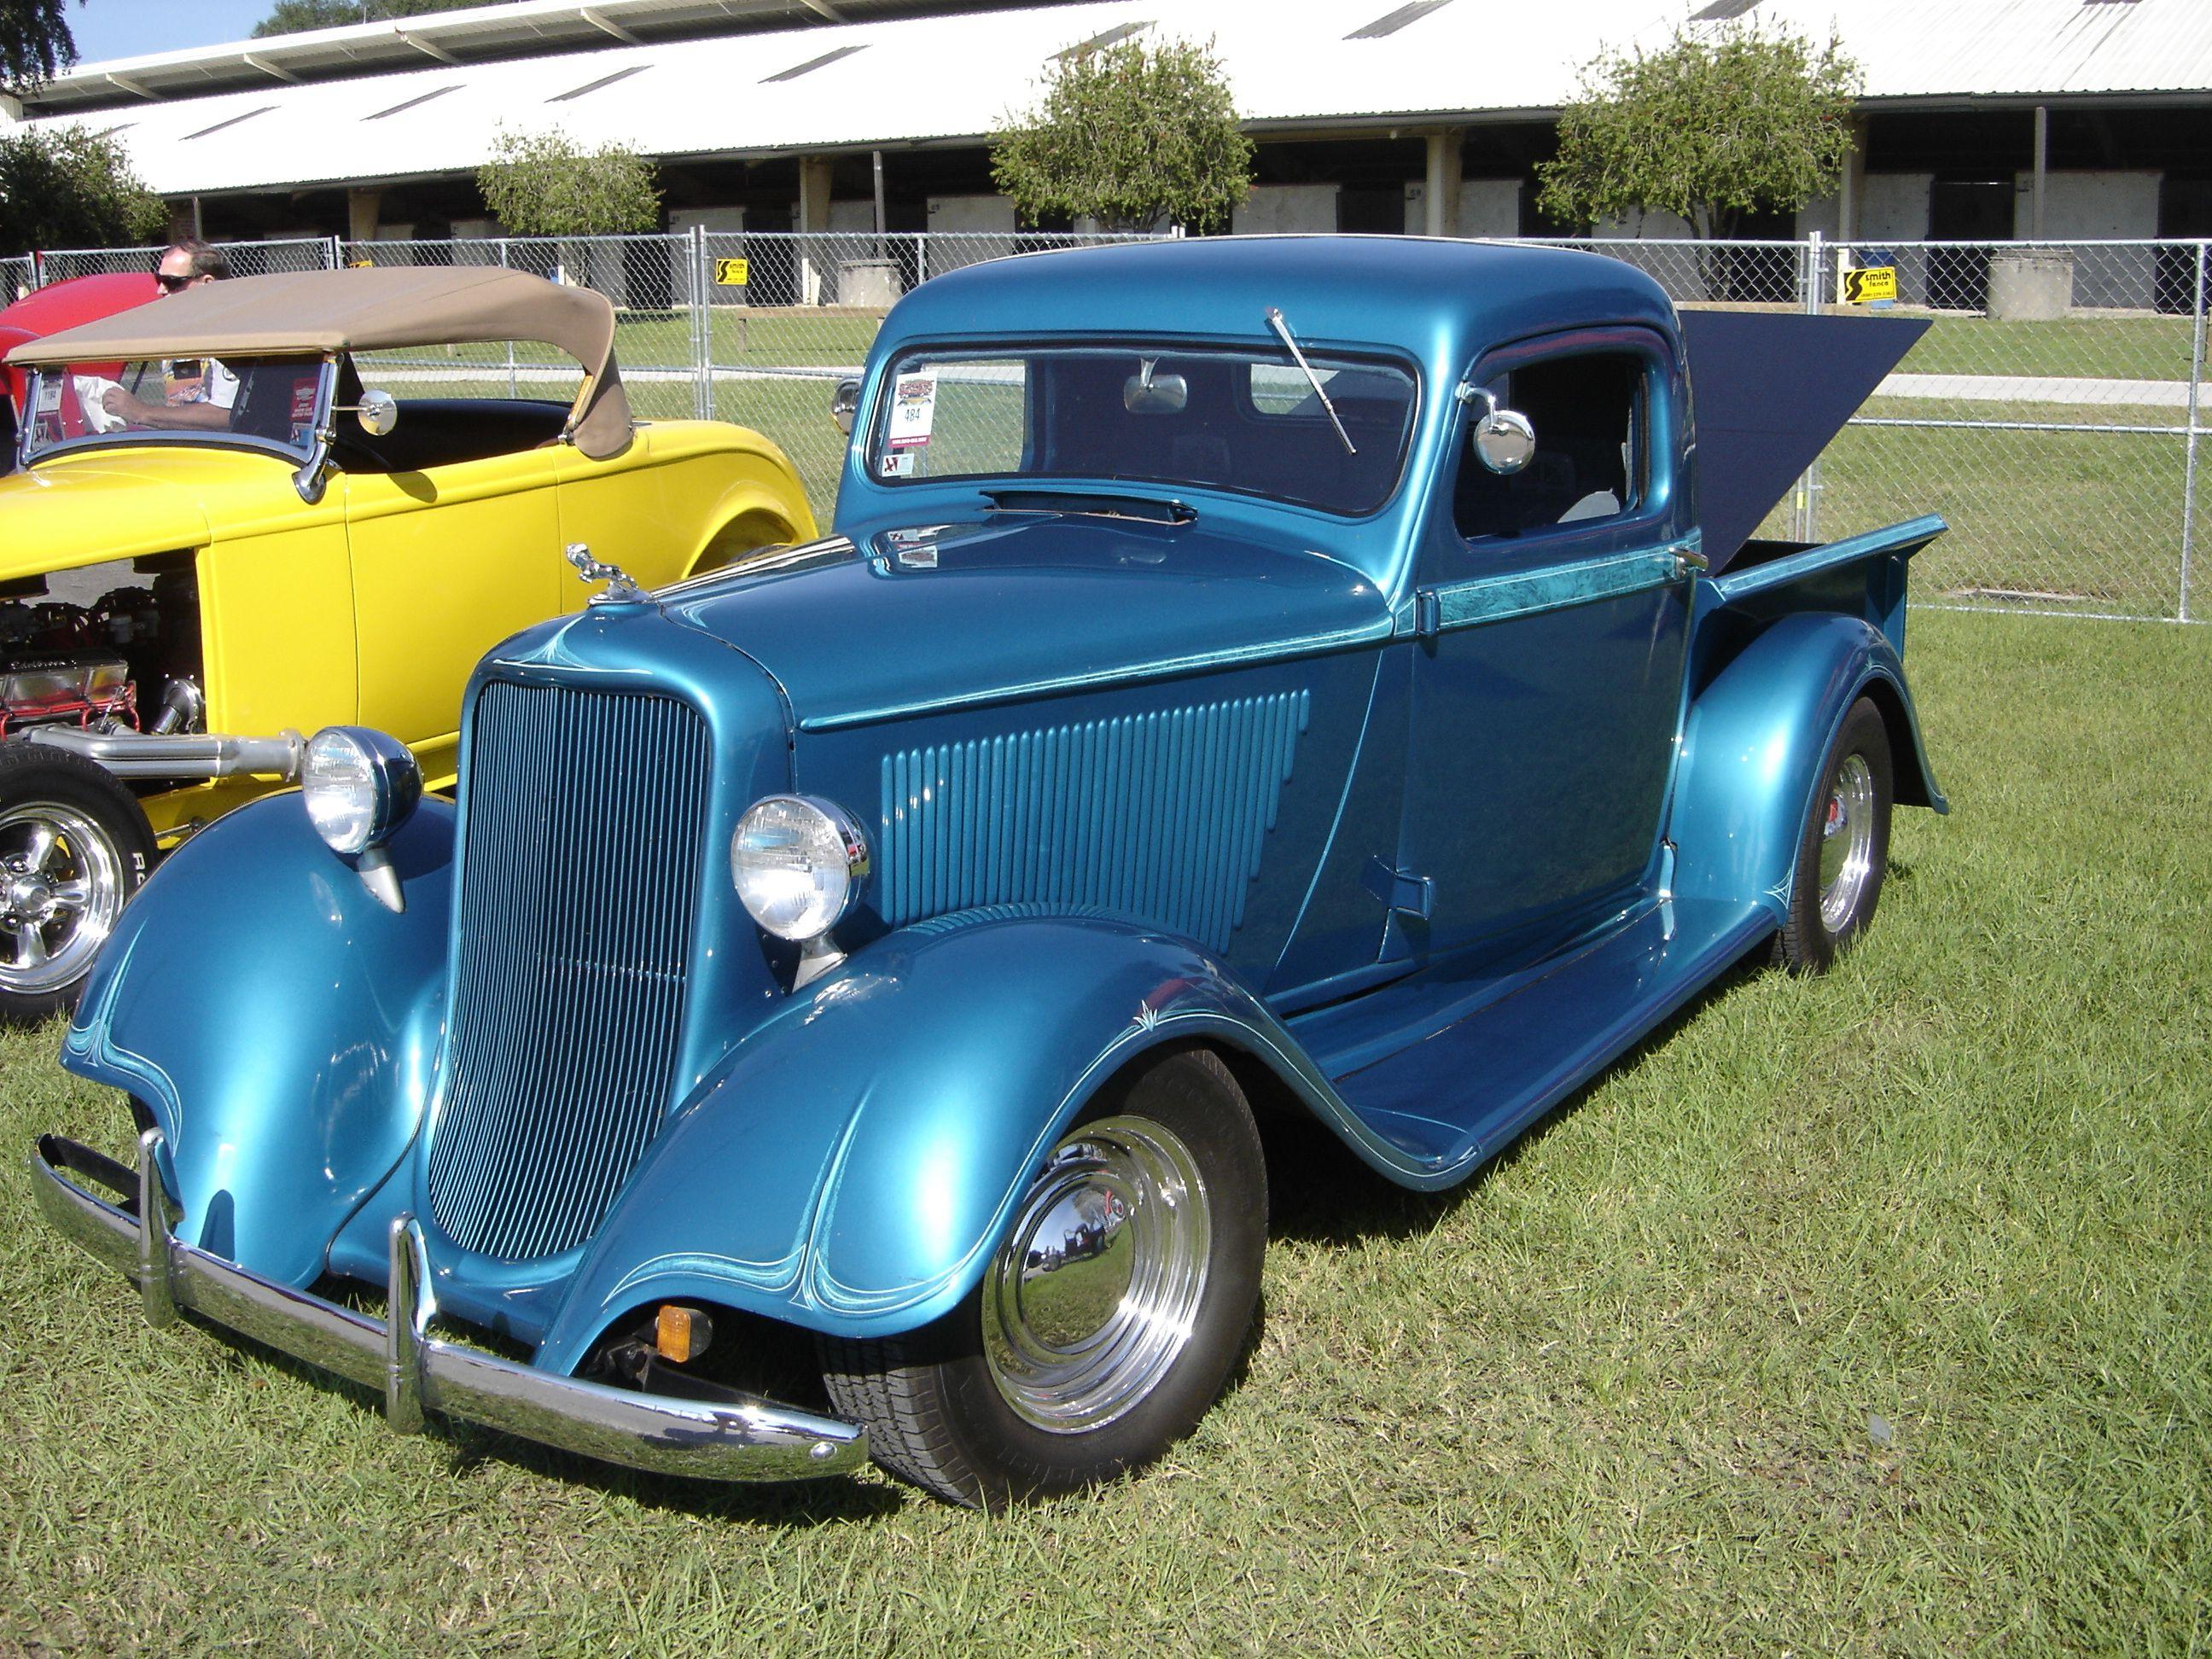 Street Rod Nationals Tampa Fl  | Street Rod & Car Shows